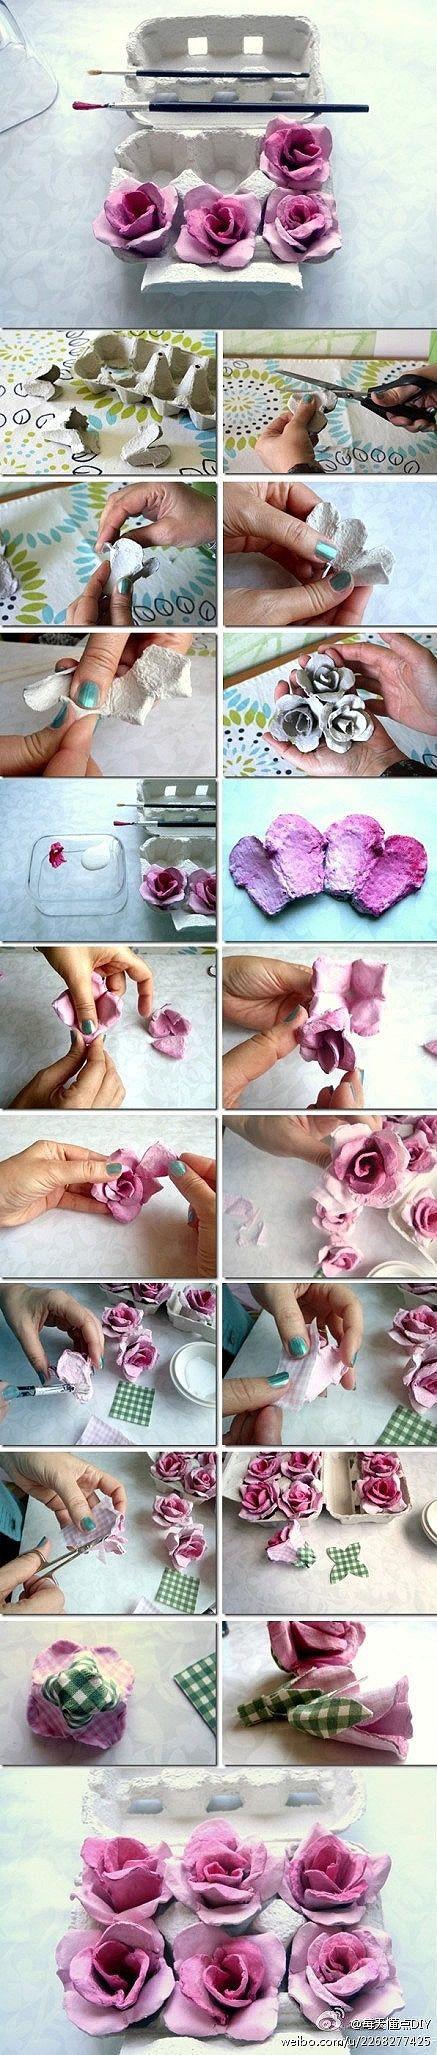 Tutorial ricicloso: DIY Pink Roses